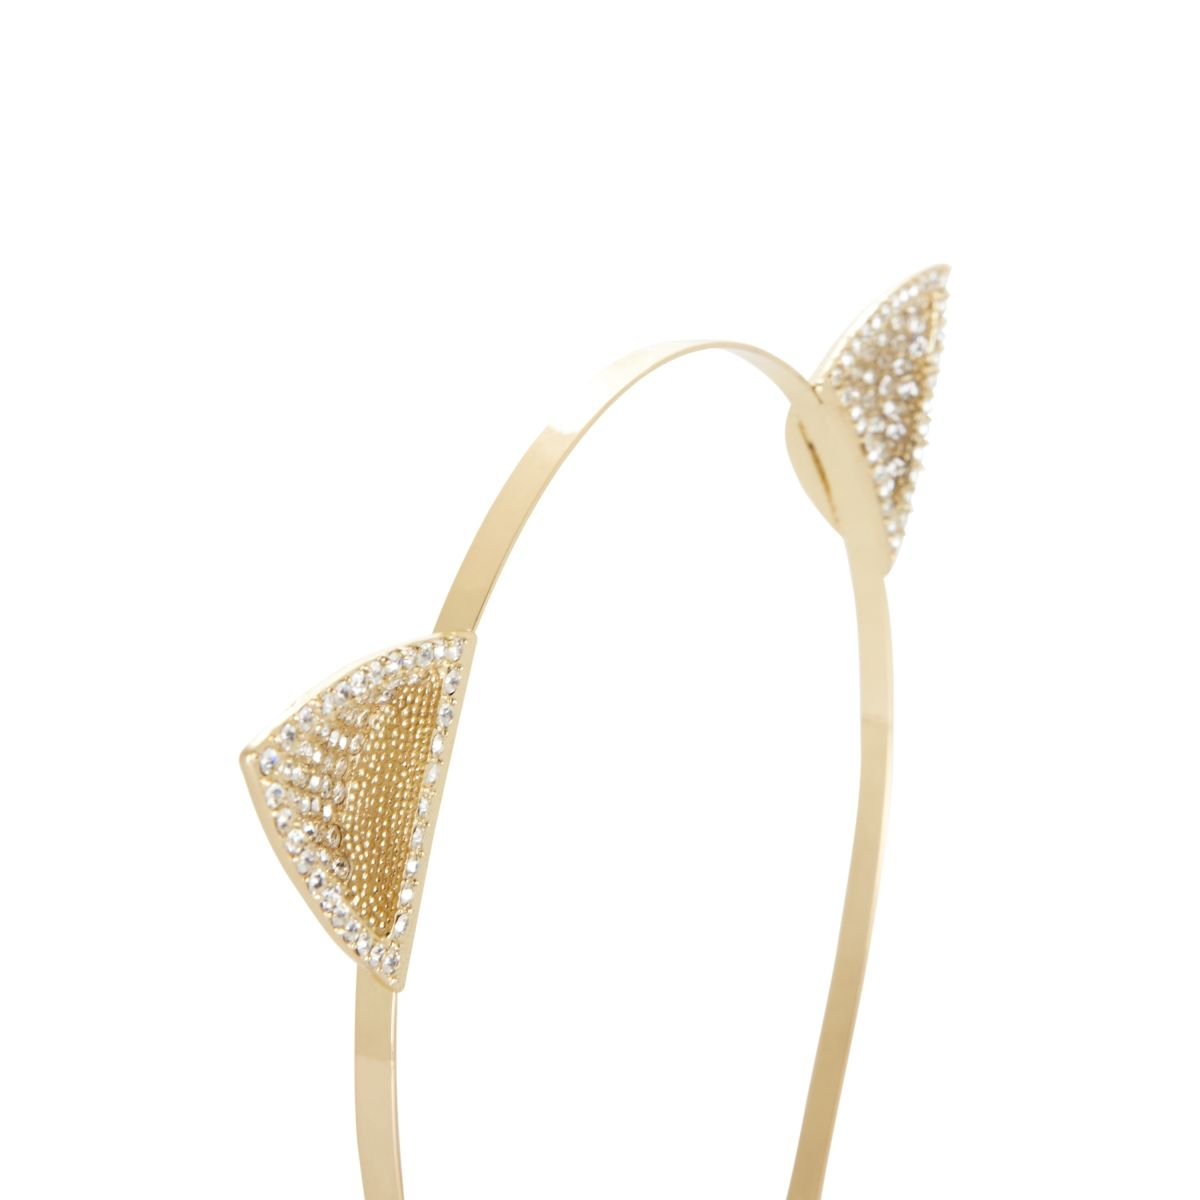 bcbg cat ears headband | headbands | Pinterest | Cat ears headband ...